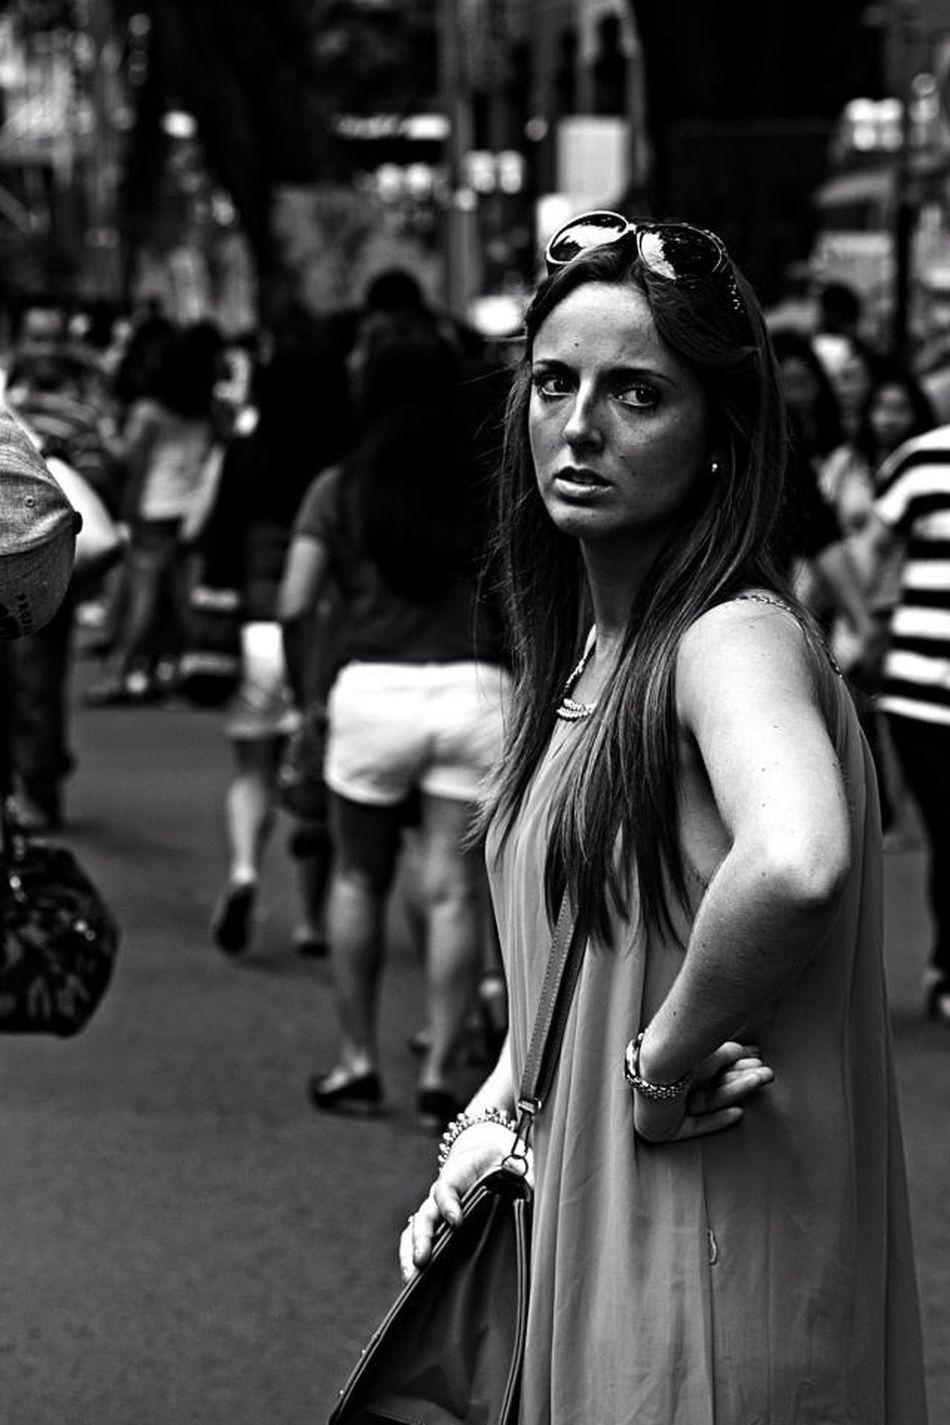 Streetphotography B+W